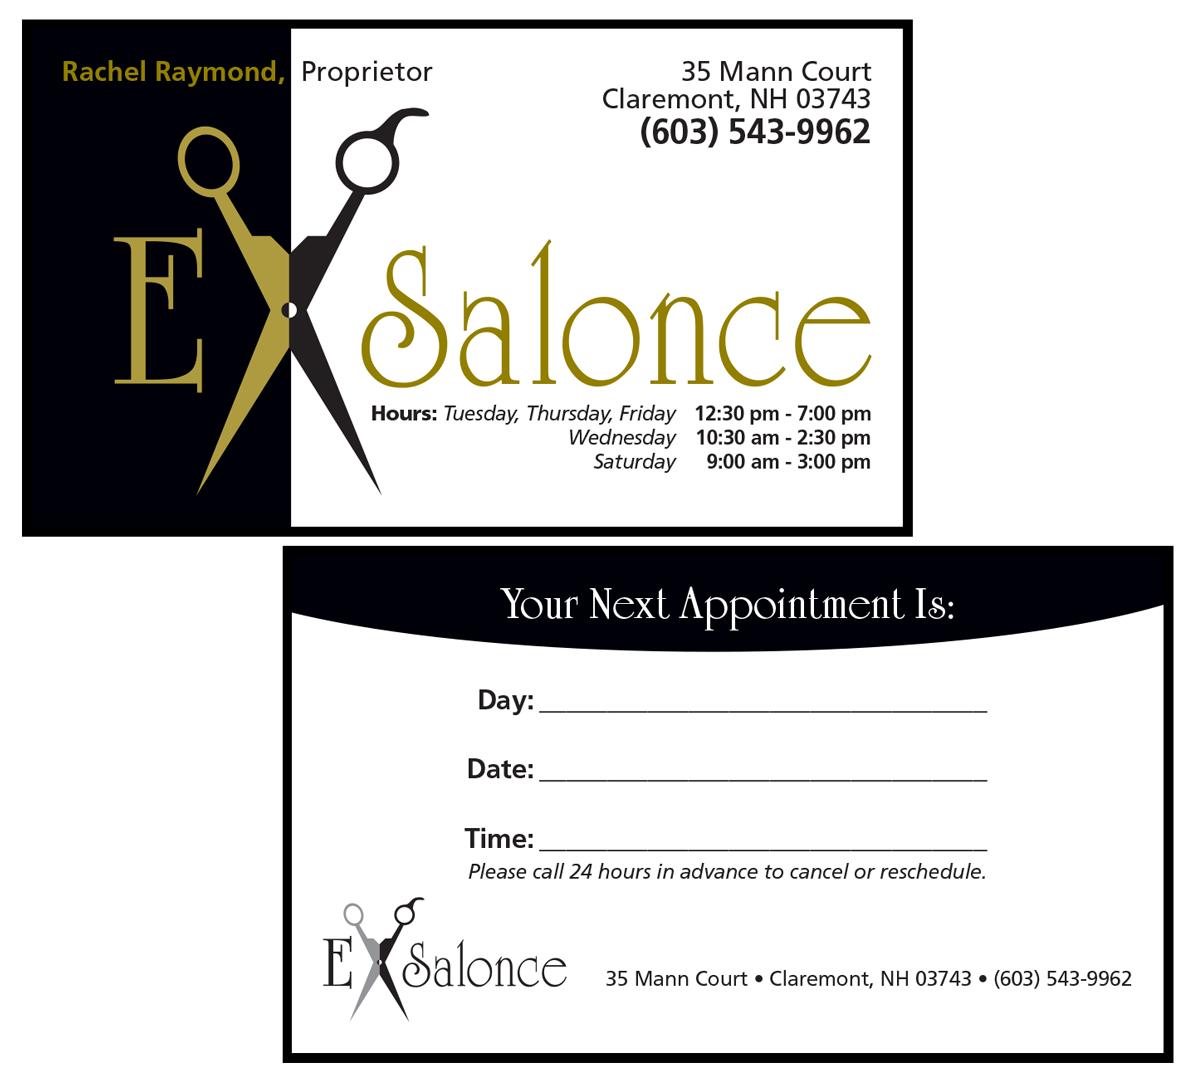 ExSalonce Business Card